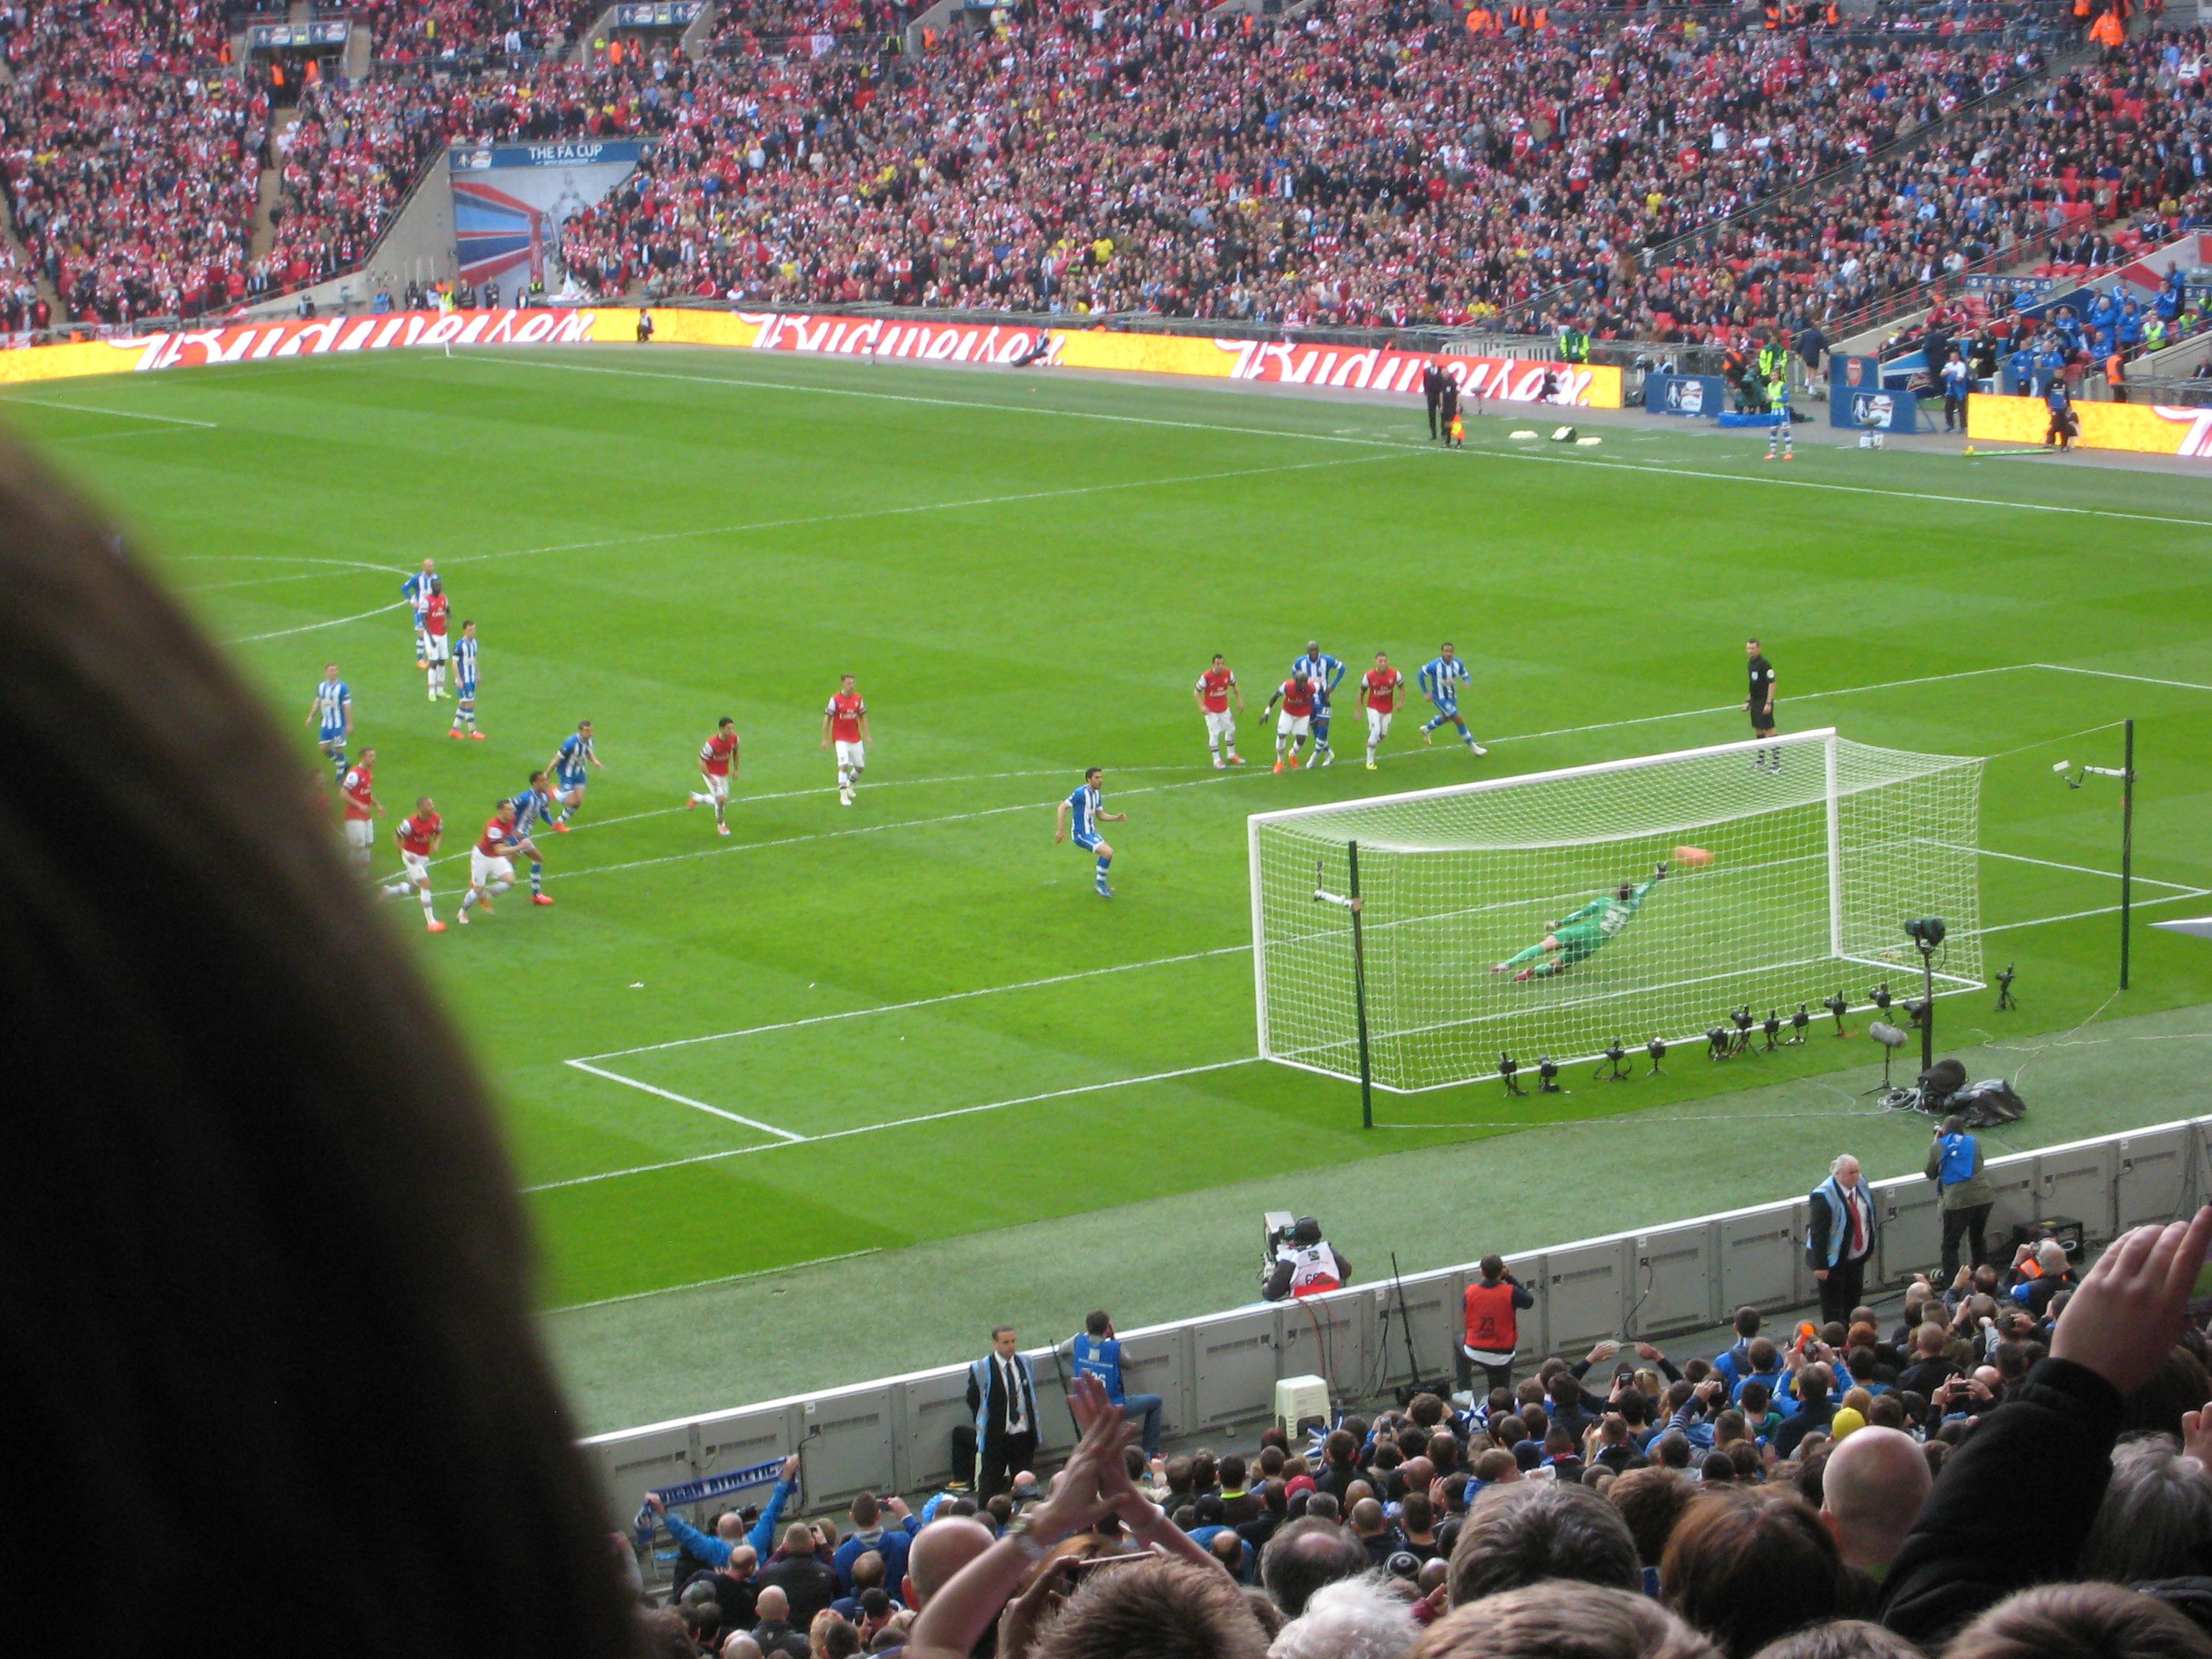 Goal! 1 - 0 Wigan (1)2